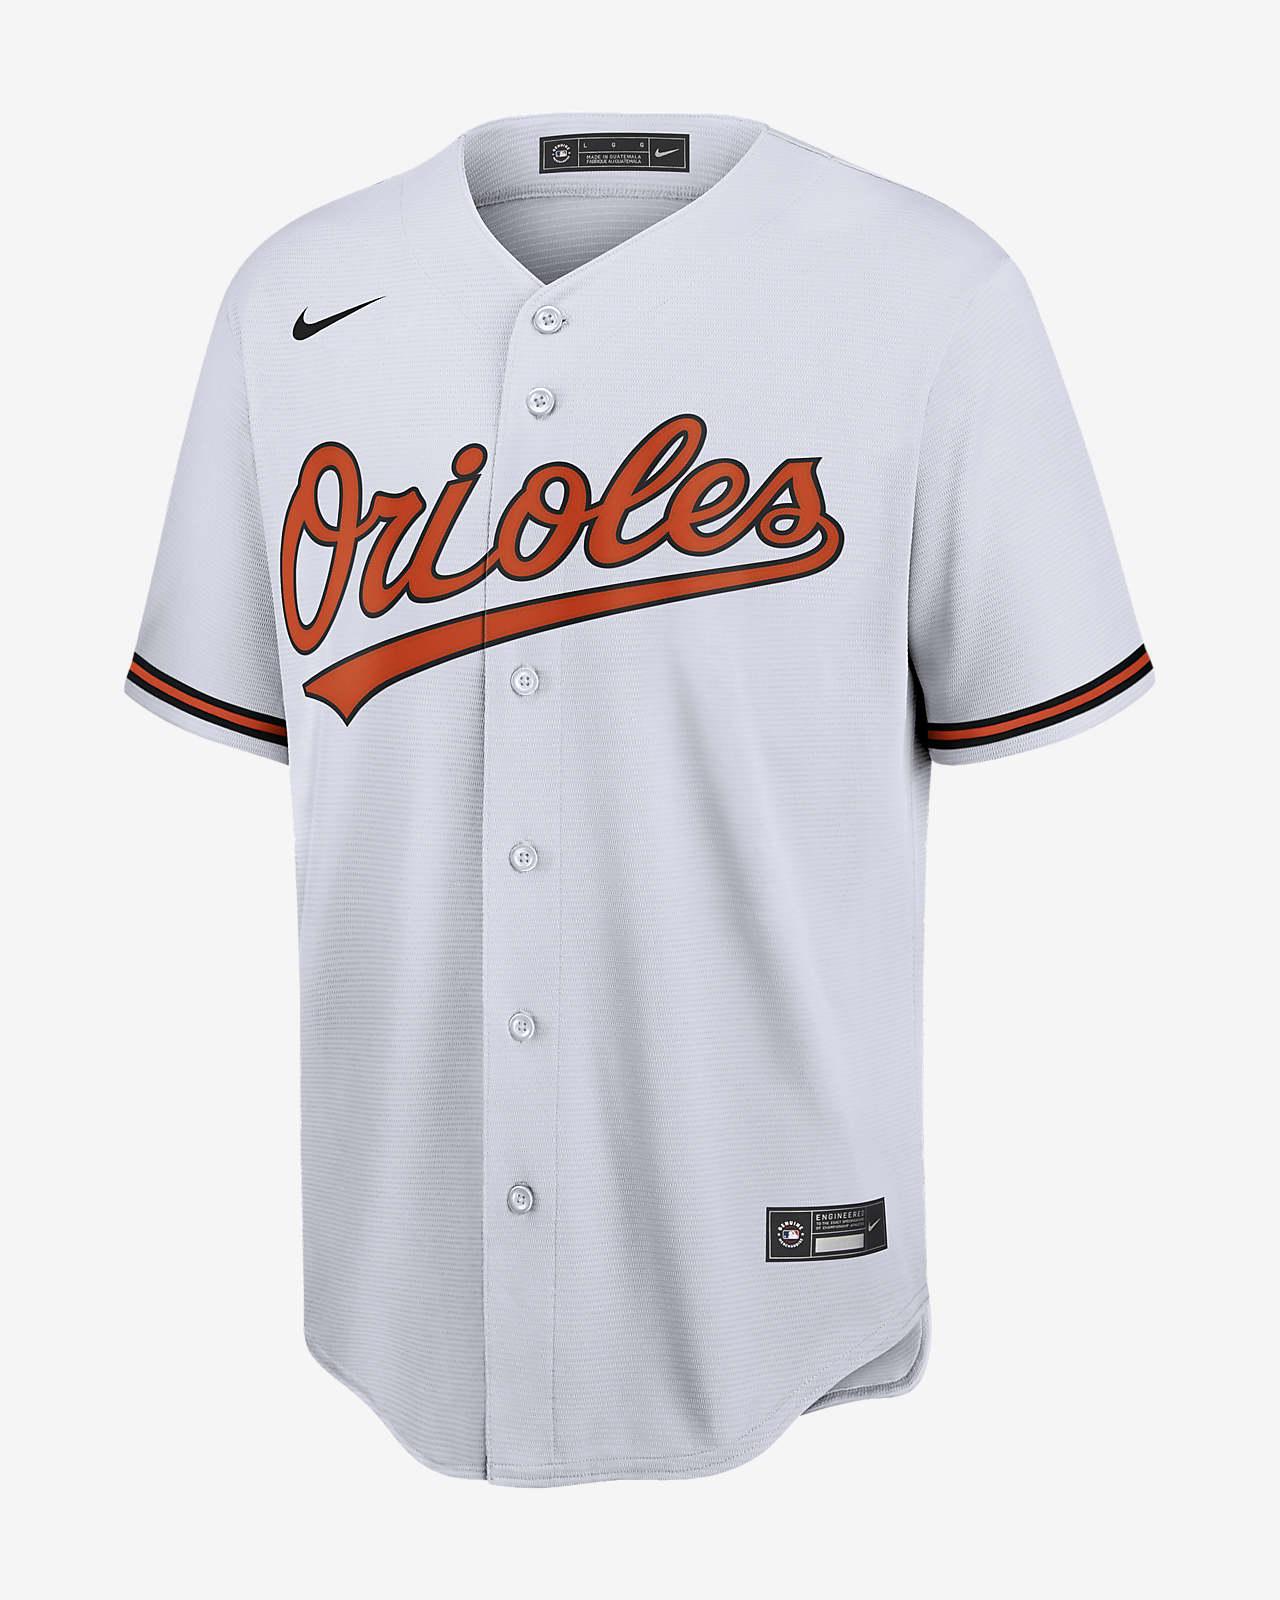 MLB Baltimore Orioles Men's Replica Baseball Jersey